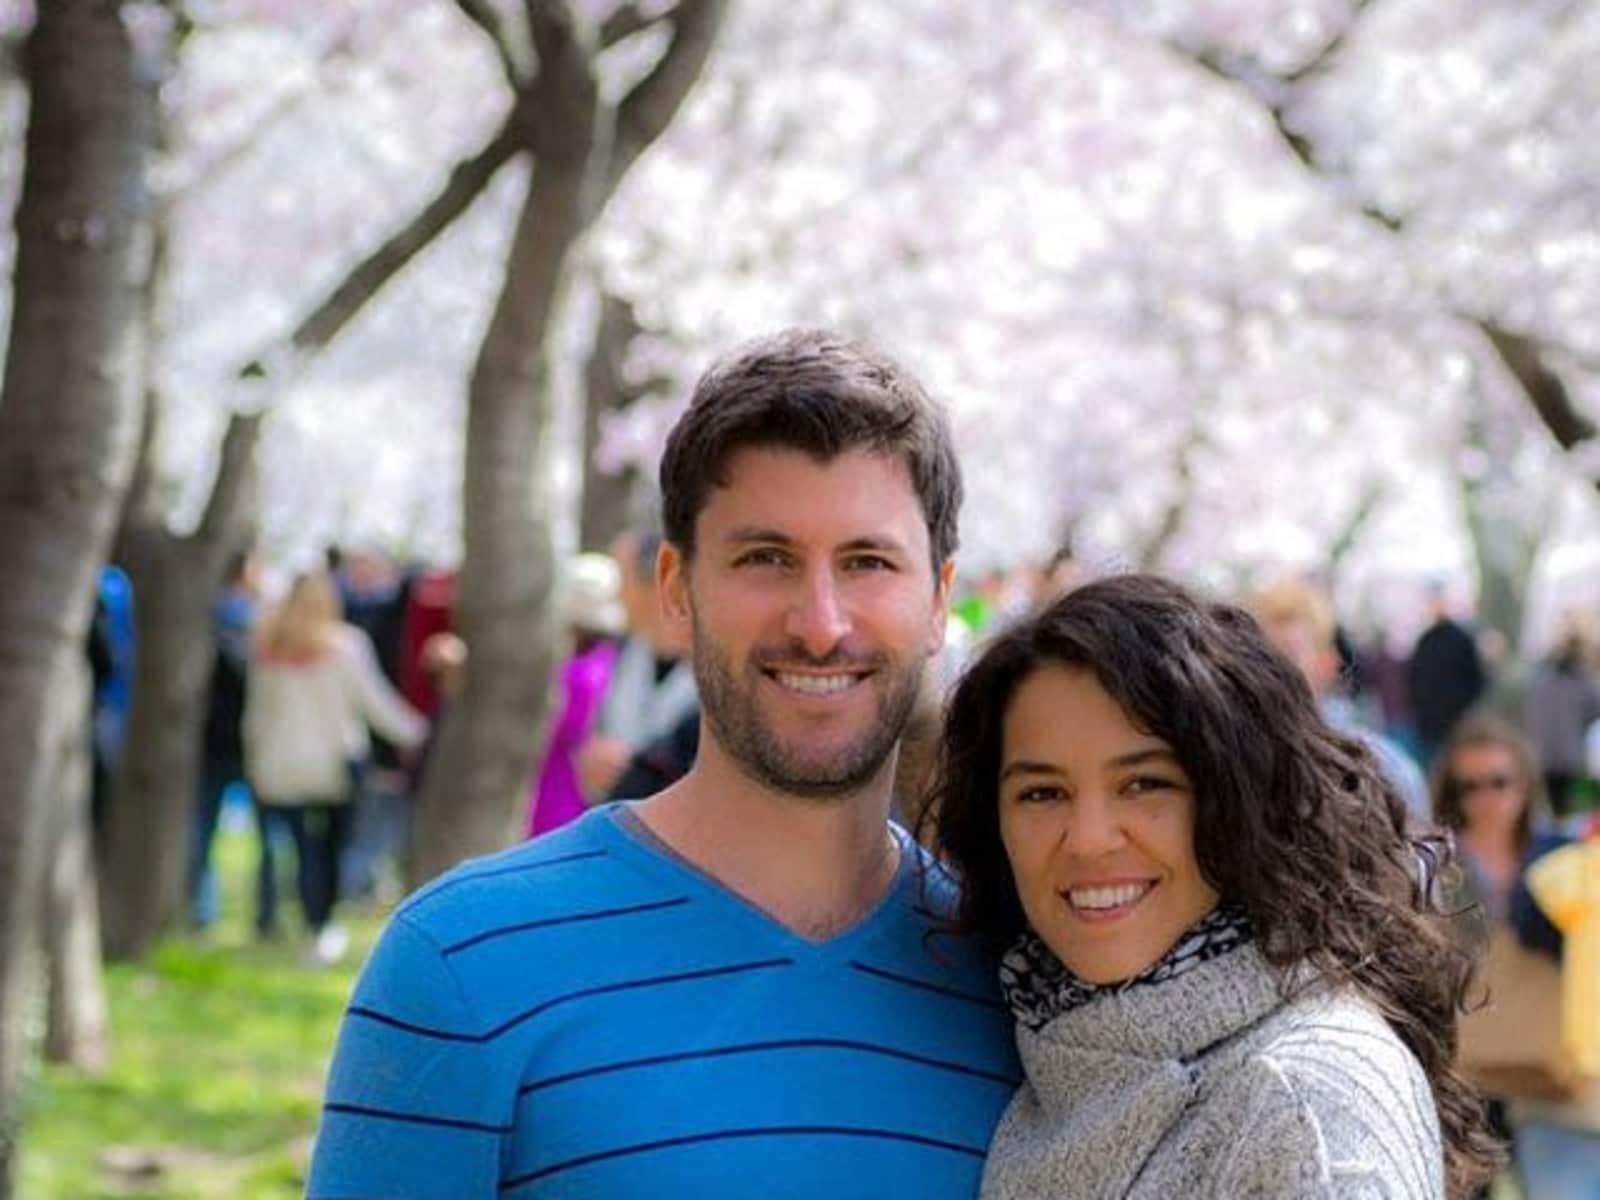 Sara & Keith from Washington, D.C., Washington, D.C., United States